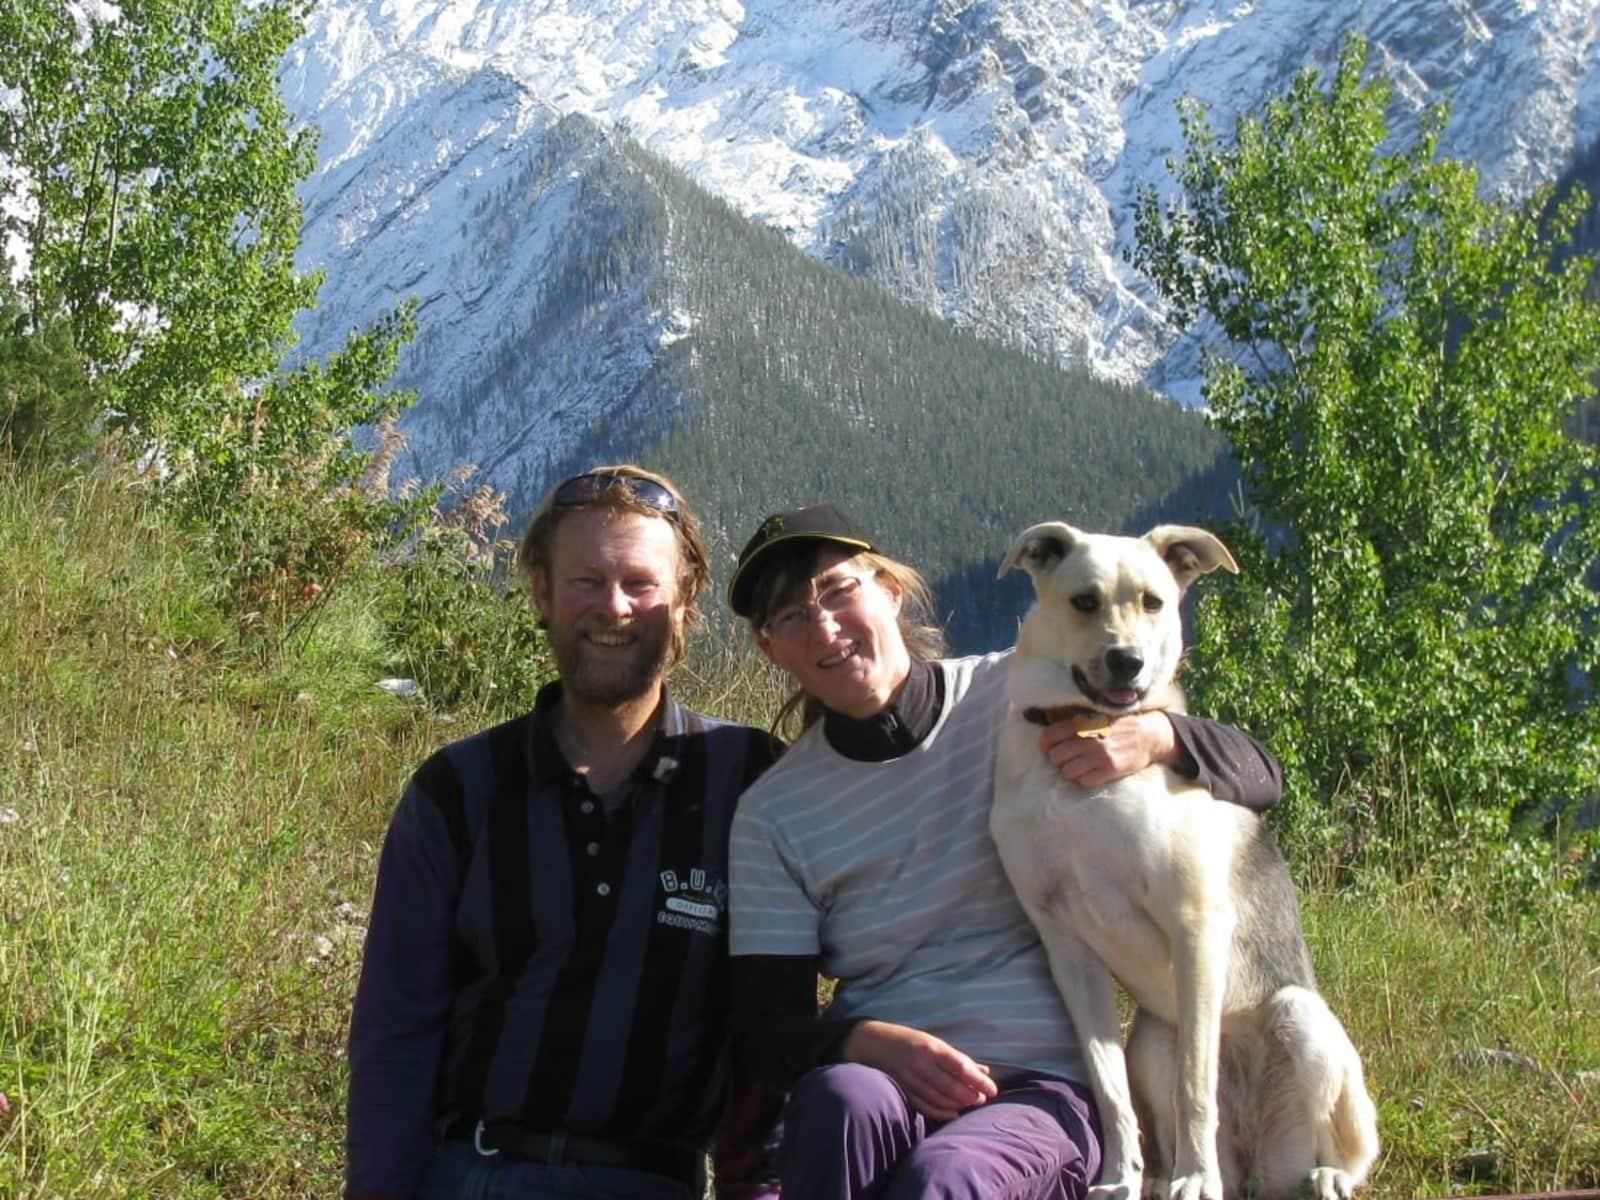 Gaby & Geoff from Parrsboro, Nova Scotia, Canada